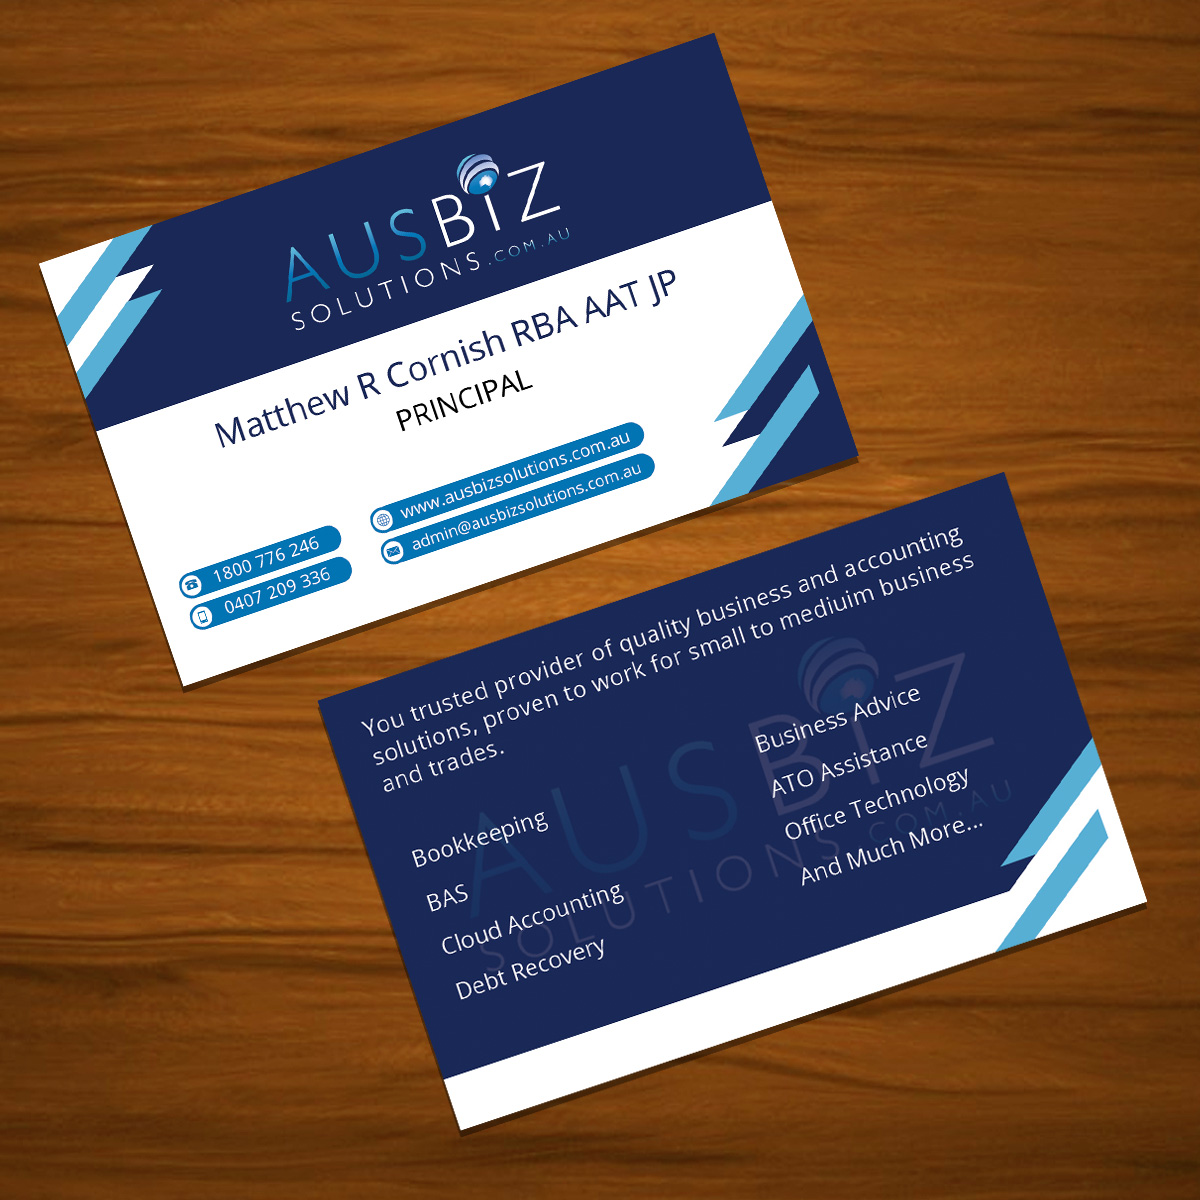 Business business card design for ausbiz solutions by tariq business business card design for ausbiz solutions in australia design 4171760 reheart Gallery